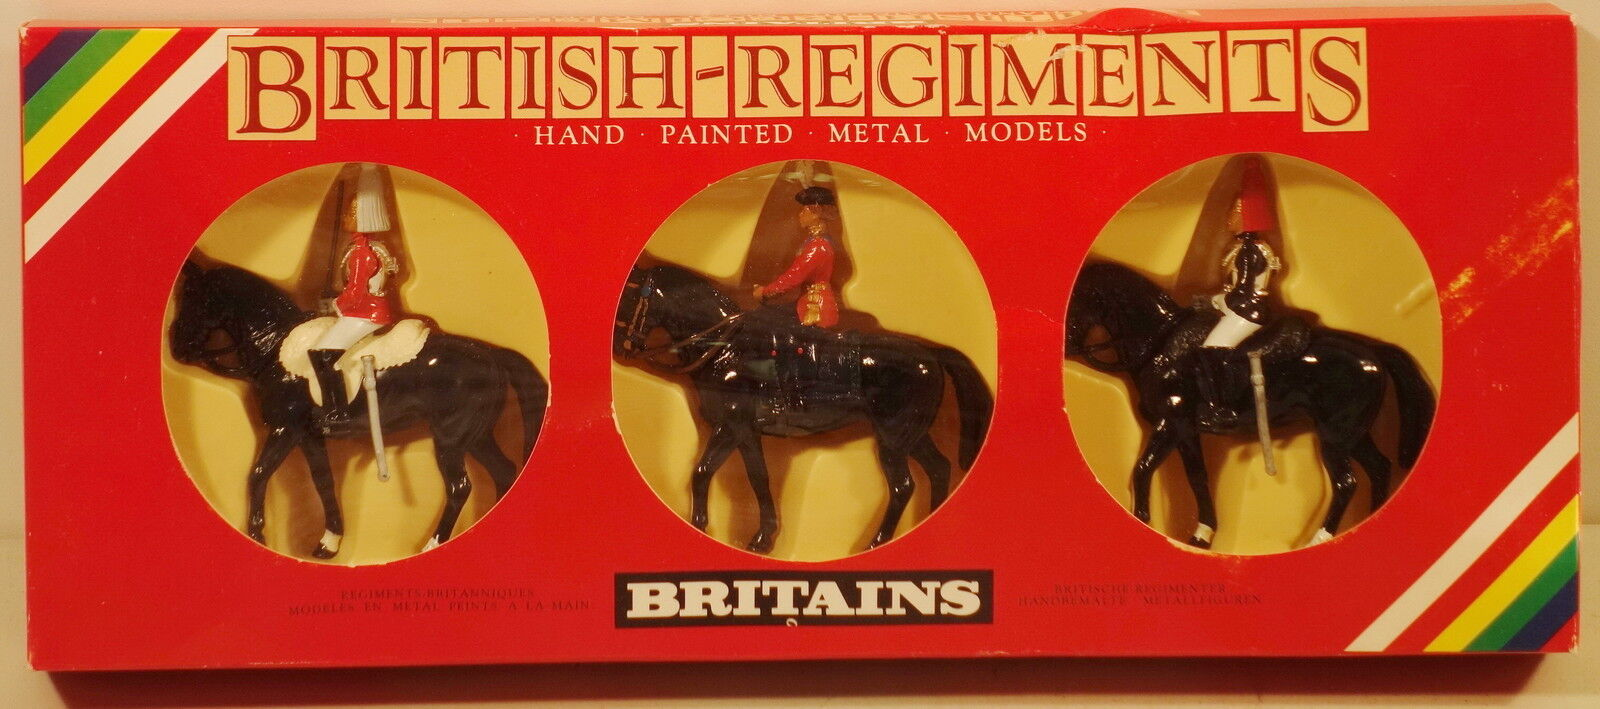 DTE 3 PC ENGLAND BRITAINS HER MAJESTY QUEEN QUEEN QUEEN ELIZABETH MOUNTED HORSEGUARD cbb5b6